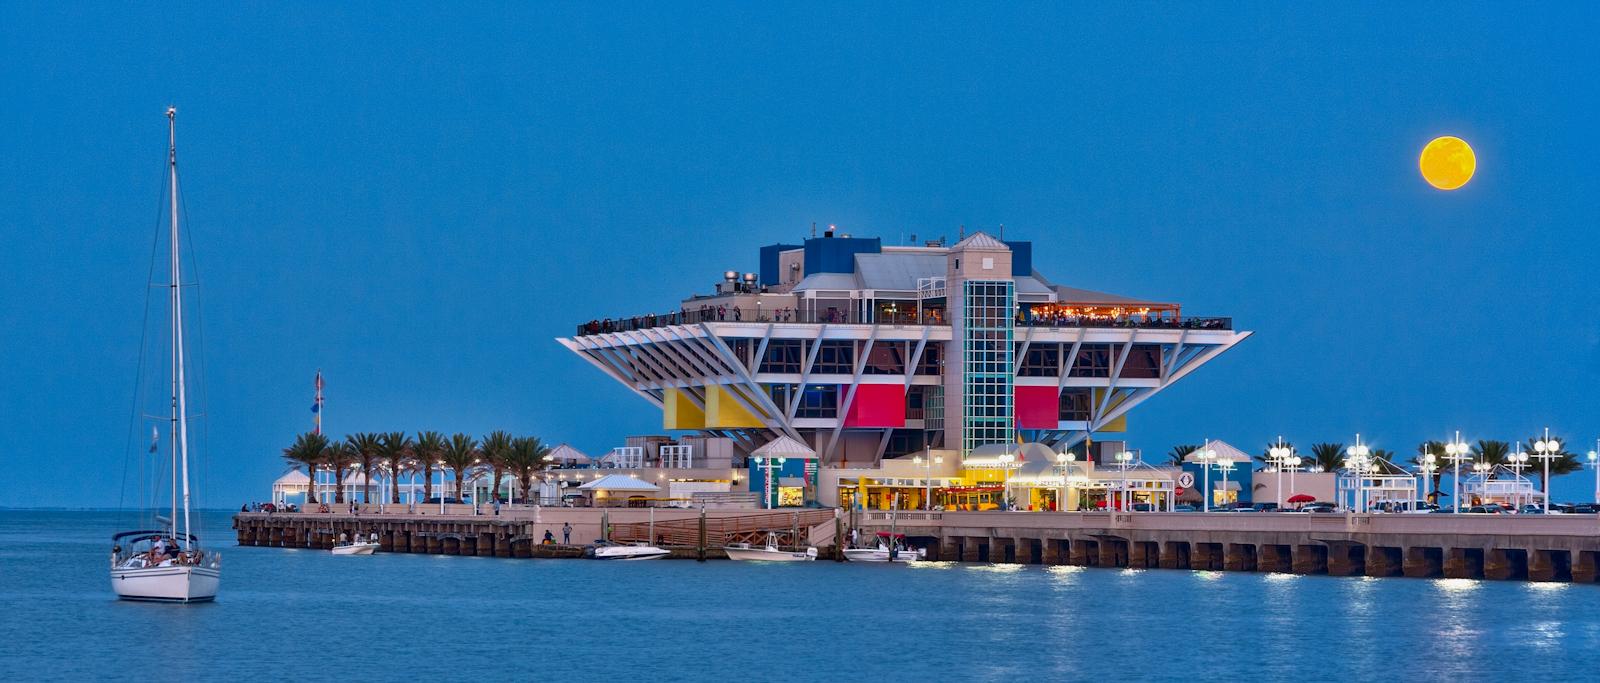 Píer em St. Petersburg, Florida (foto: Matthew Paulson/Flickr/creative commons)